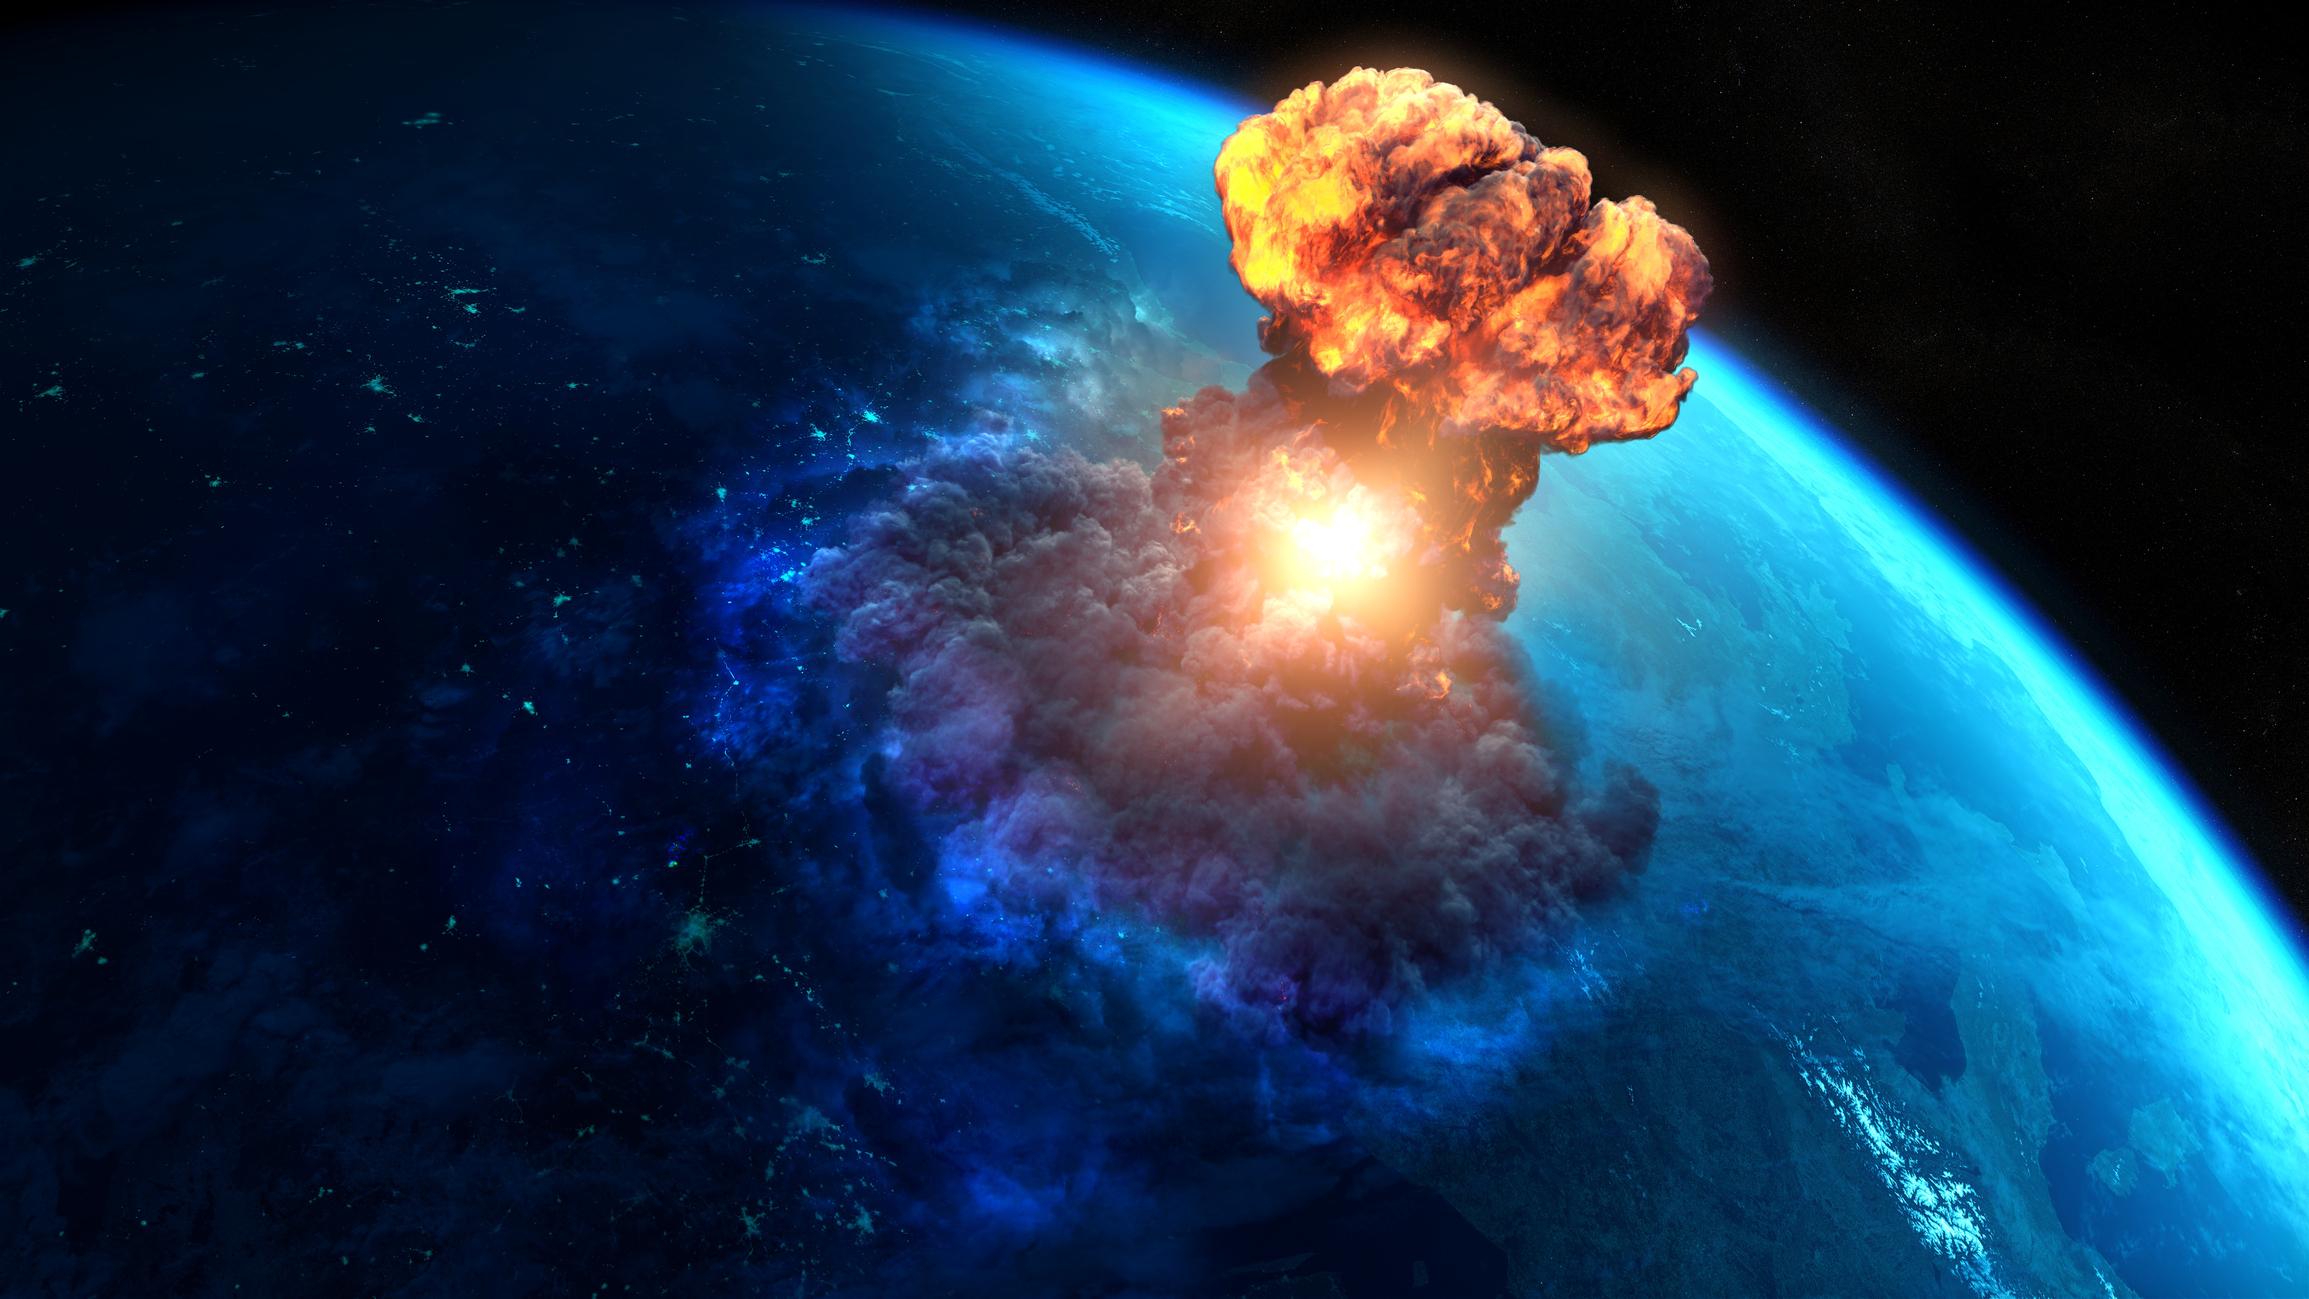 Mushroom cloud emerging from Earth